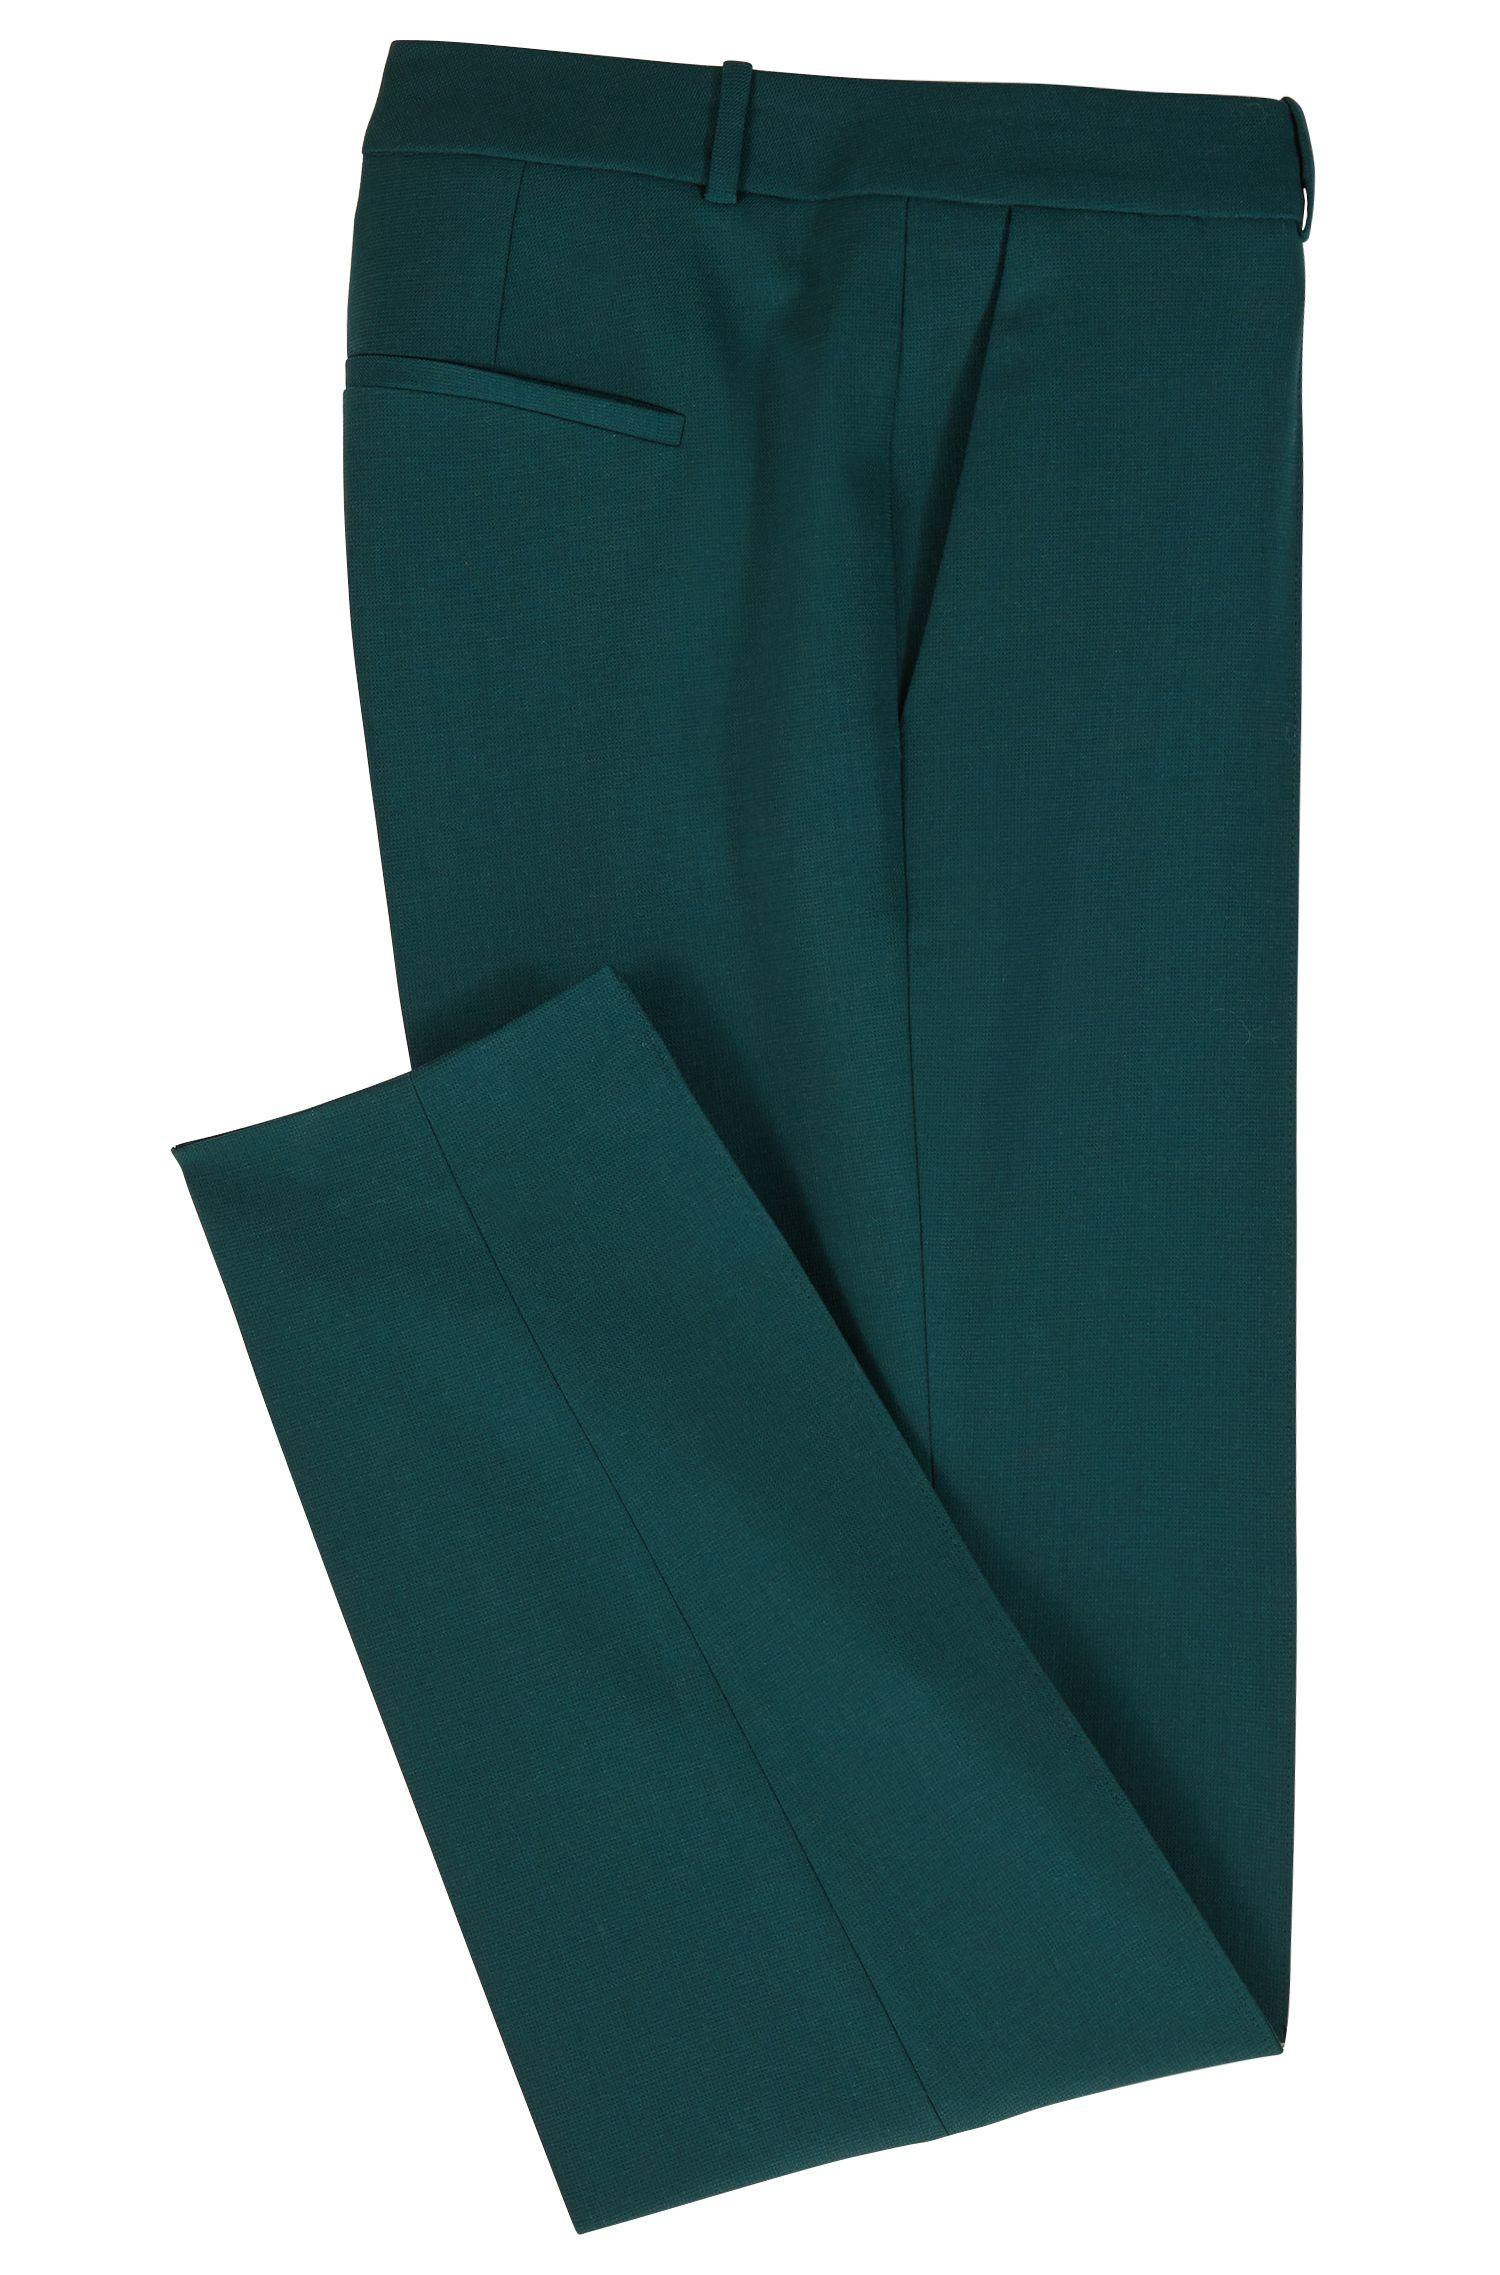 Pleat-front trousers in stretch virgin wool, Green